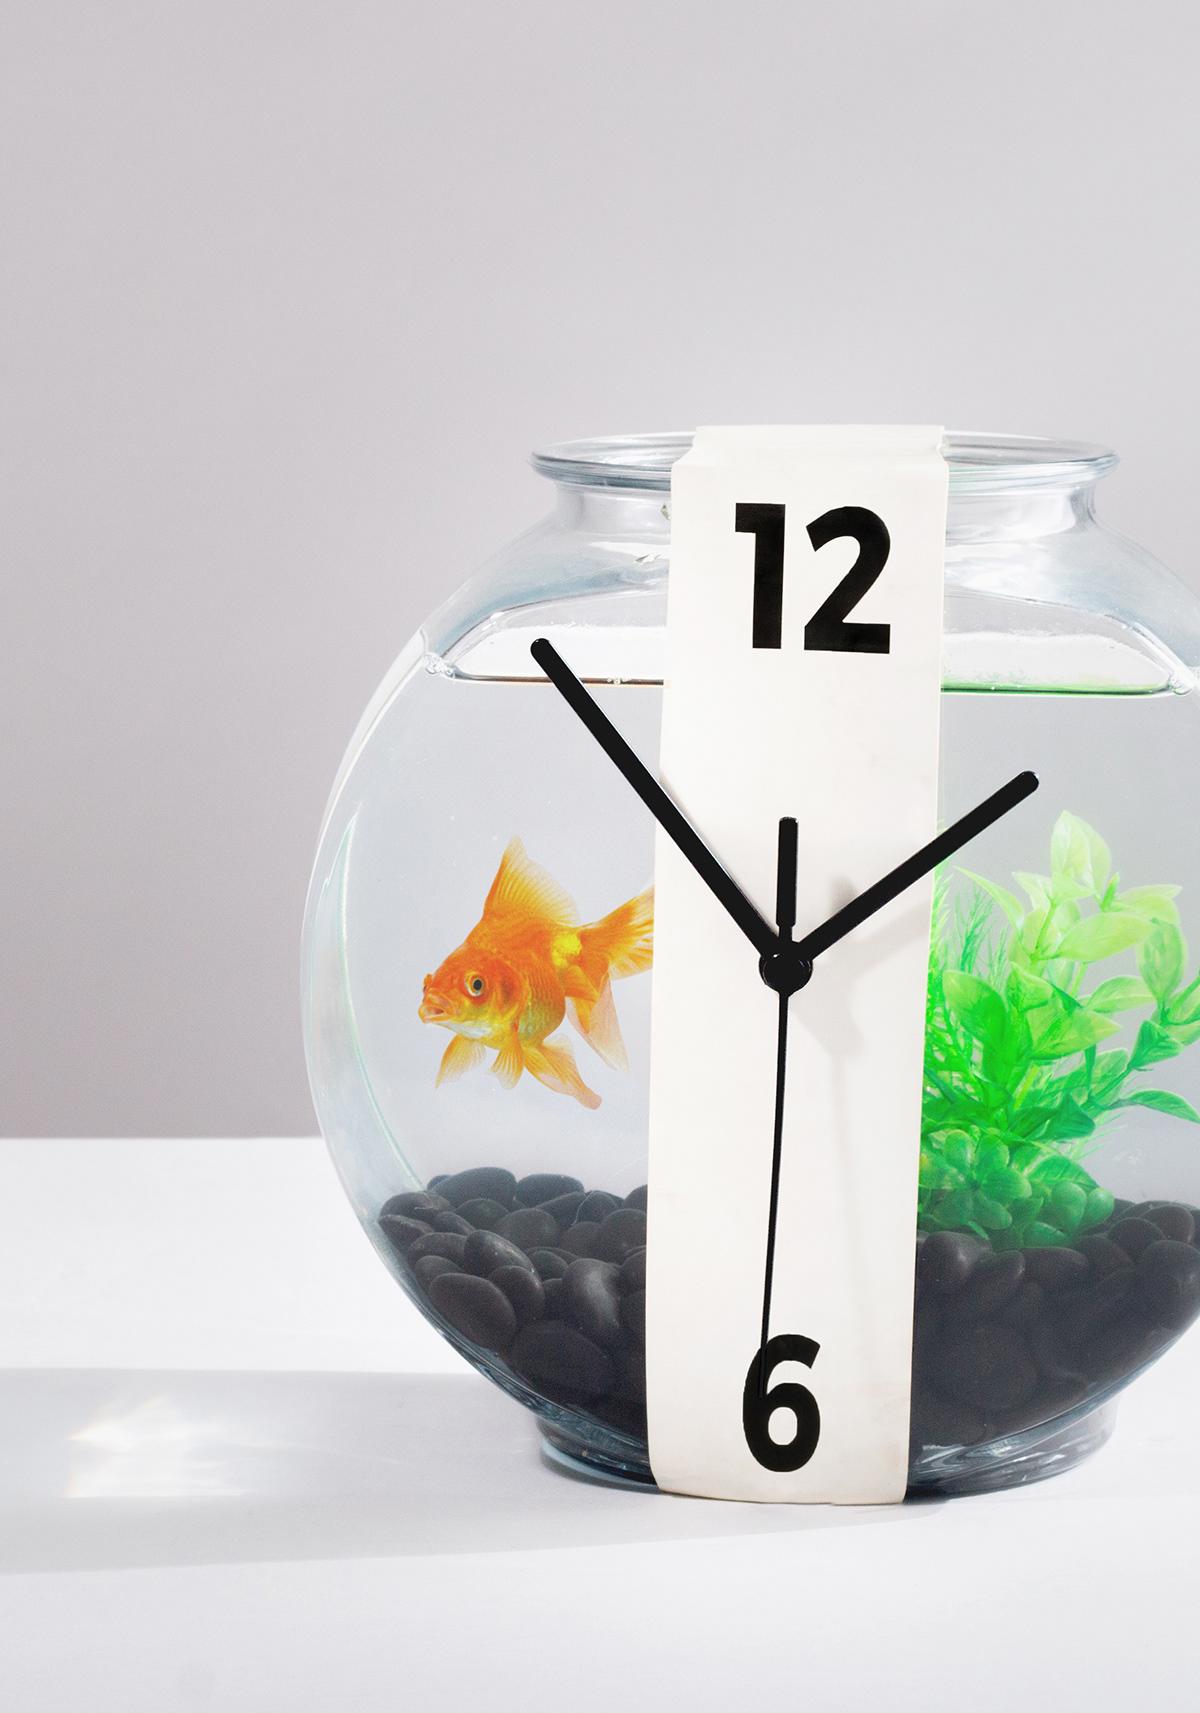 Image may contain: aquarium and clock